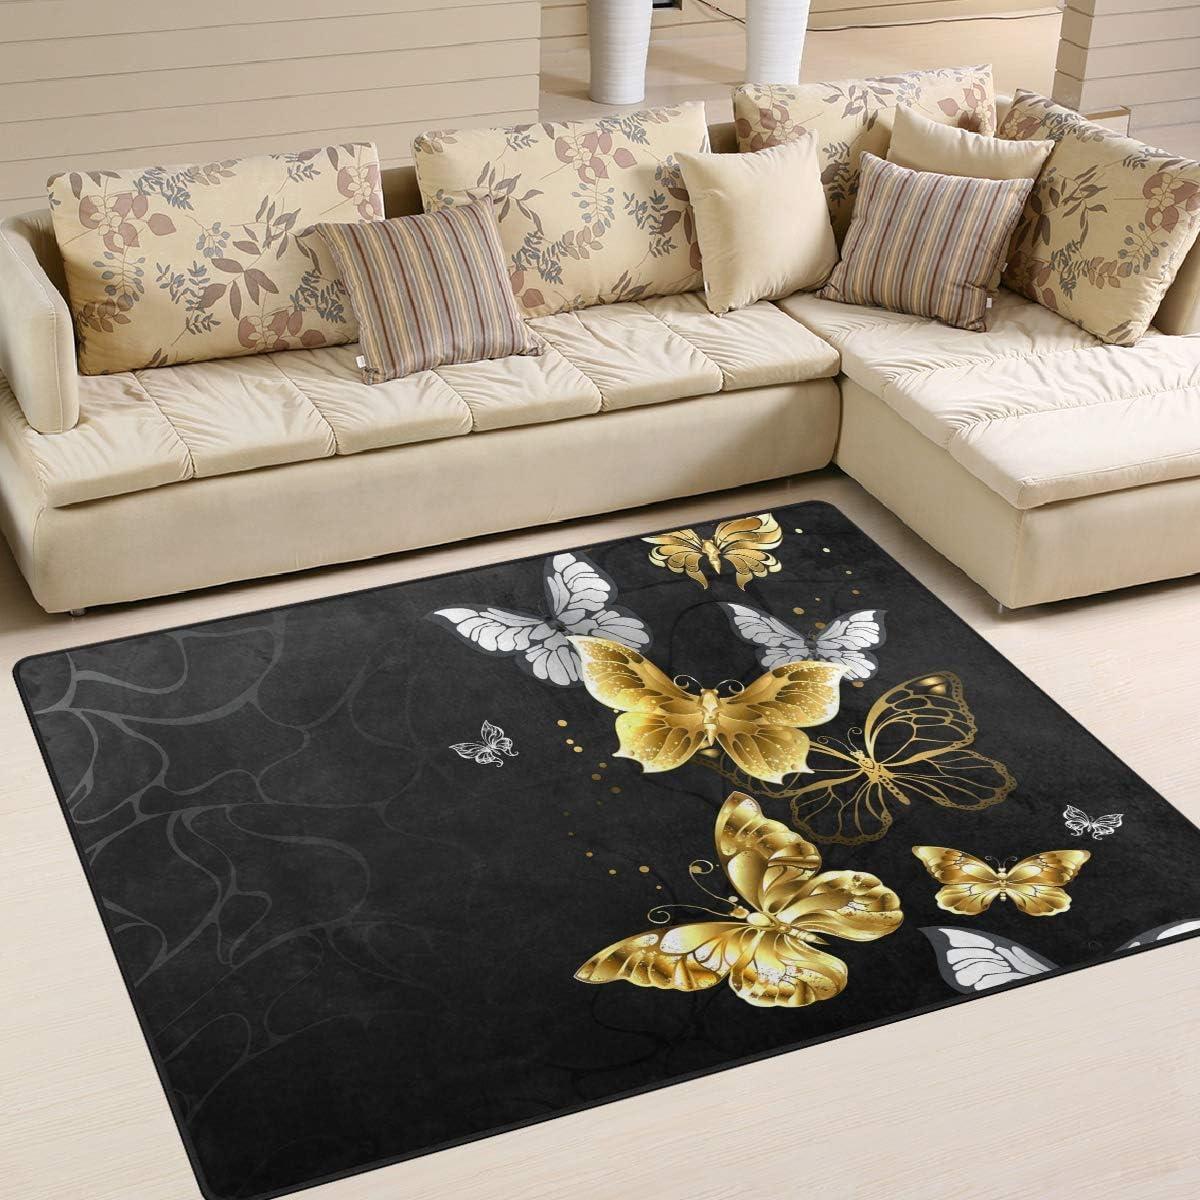 Agona Gold White Butterflies Black Area Rug 5x7 Soft Large Area Rugs Indoor Modern Floor Carpet No Shedding Non Slip Rectangle Mat For Living Room Entryway Bedroom Kids Room Home Kitchen